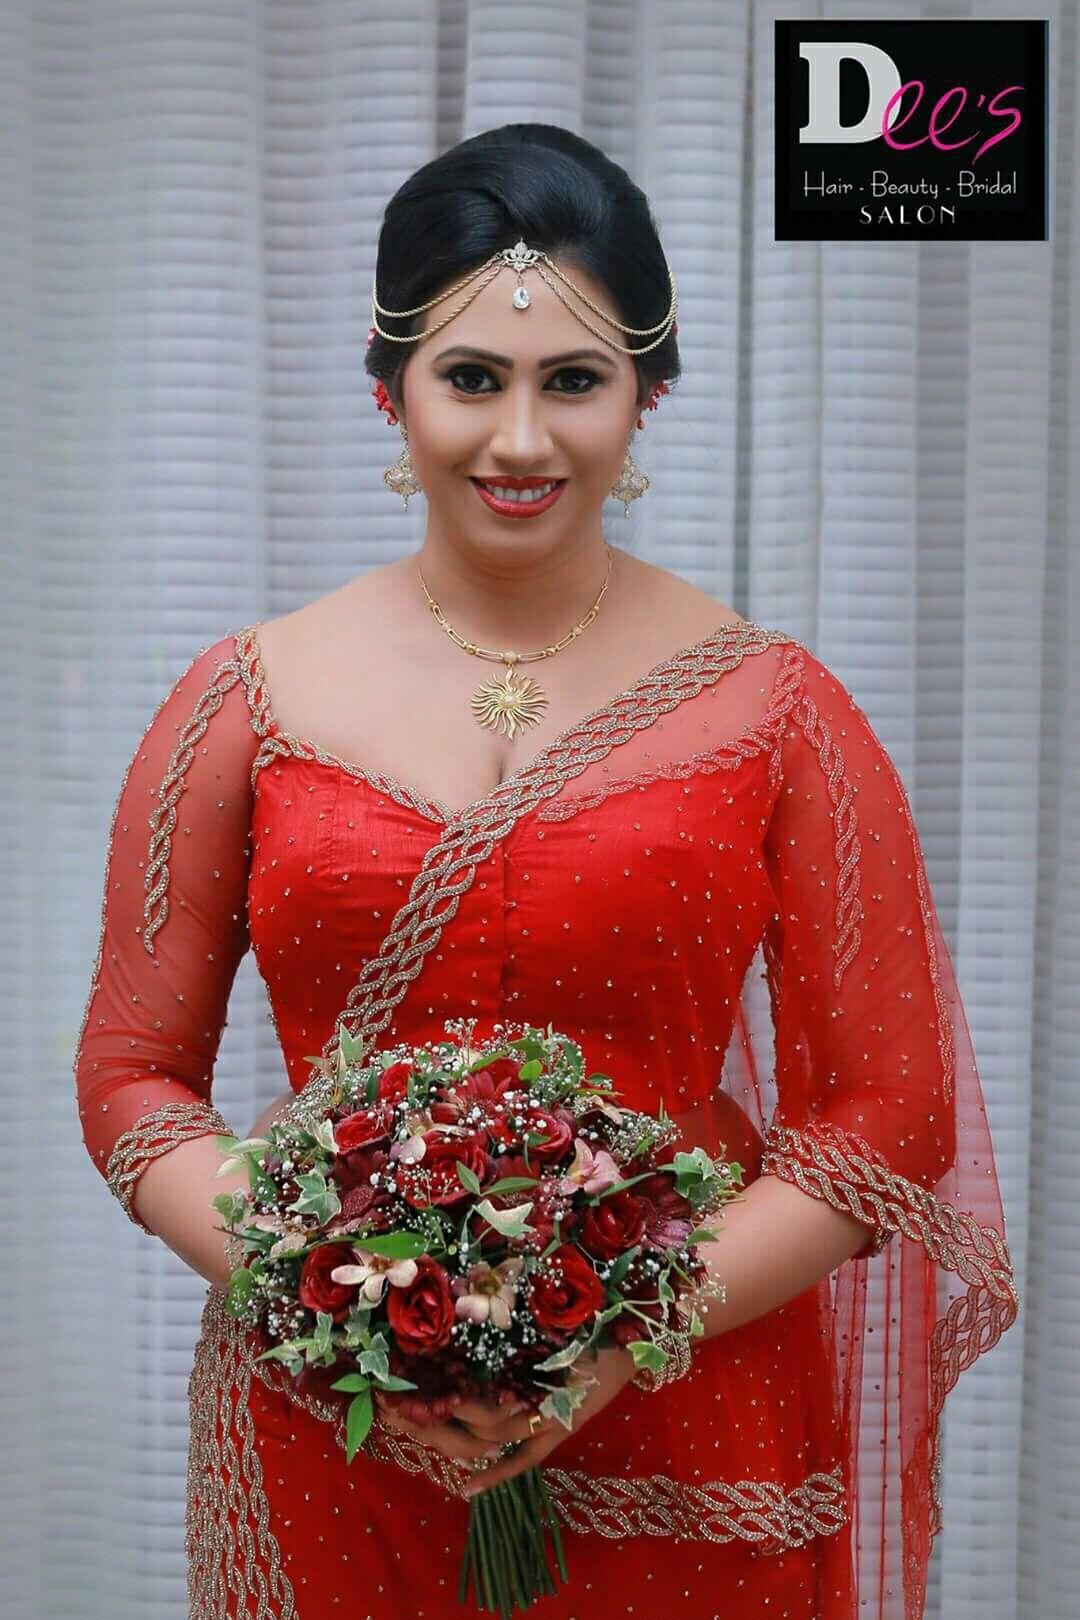 Dressed by dees sri lankan wedding in pinterest dresses